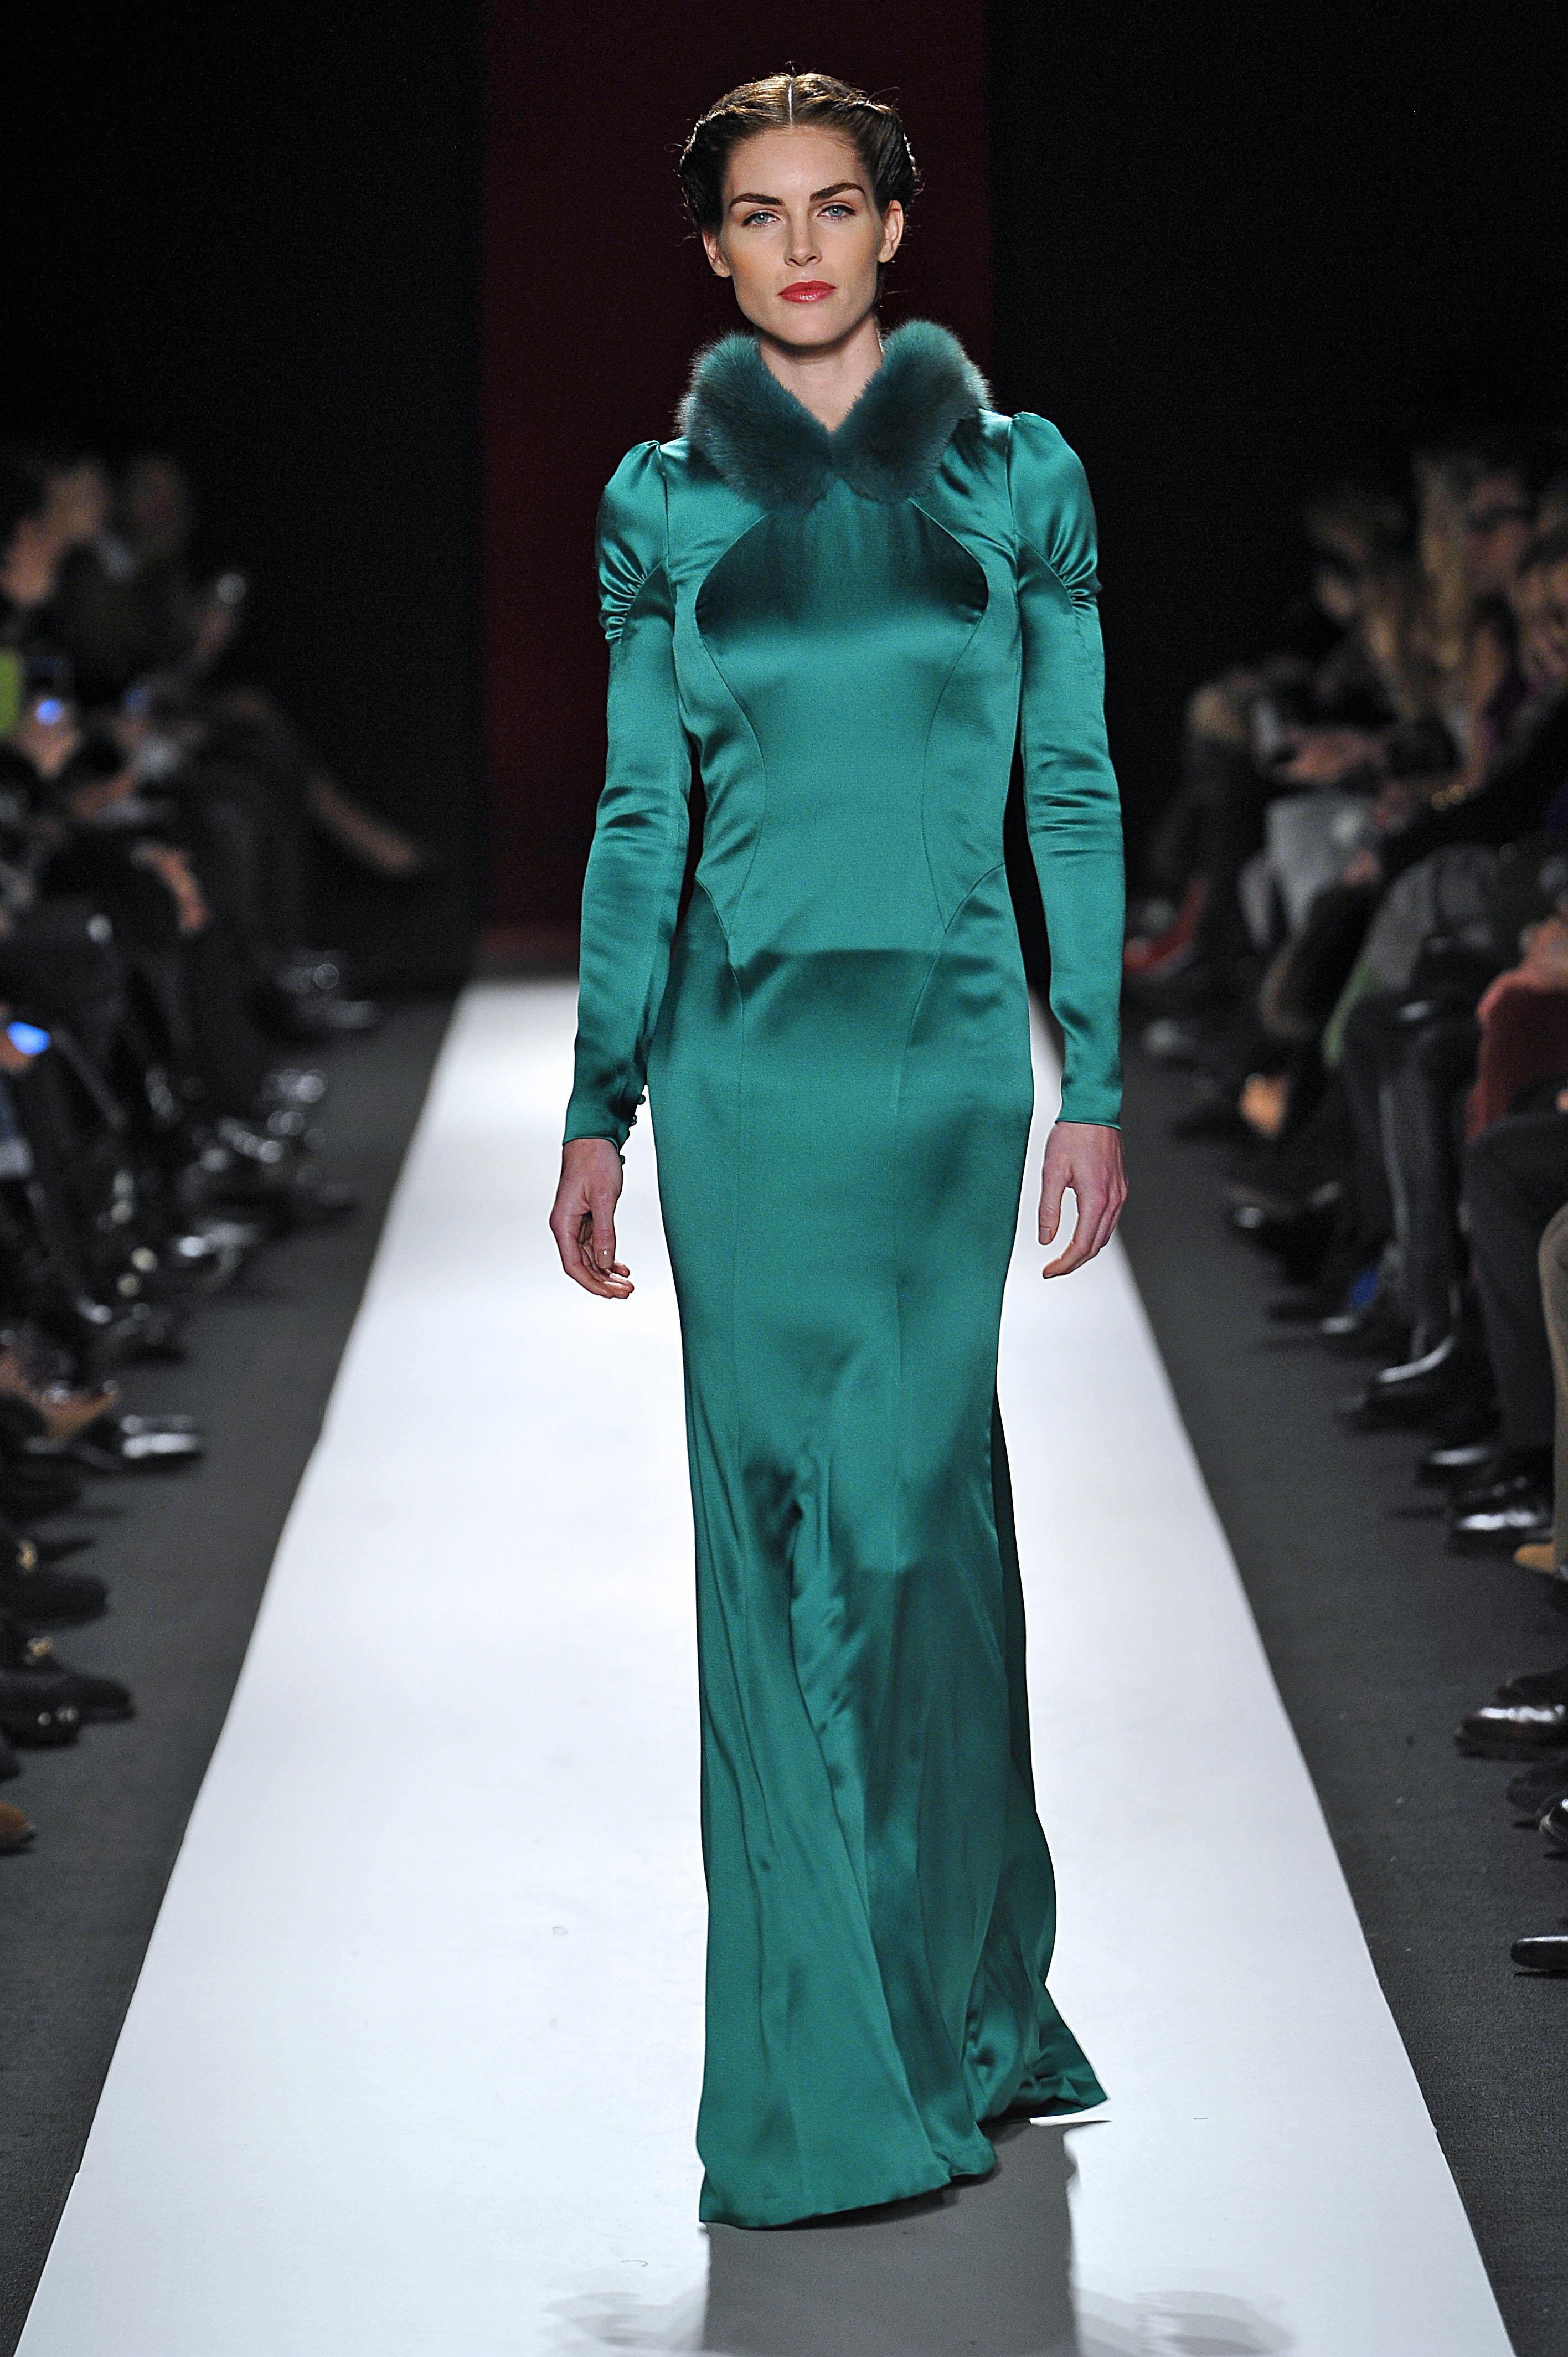 727c56345033 Ready to Wear Fall Winter 2013 Carolina Herrera New York Fashion Week Feb  2013